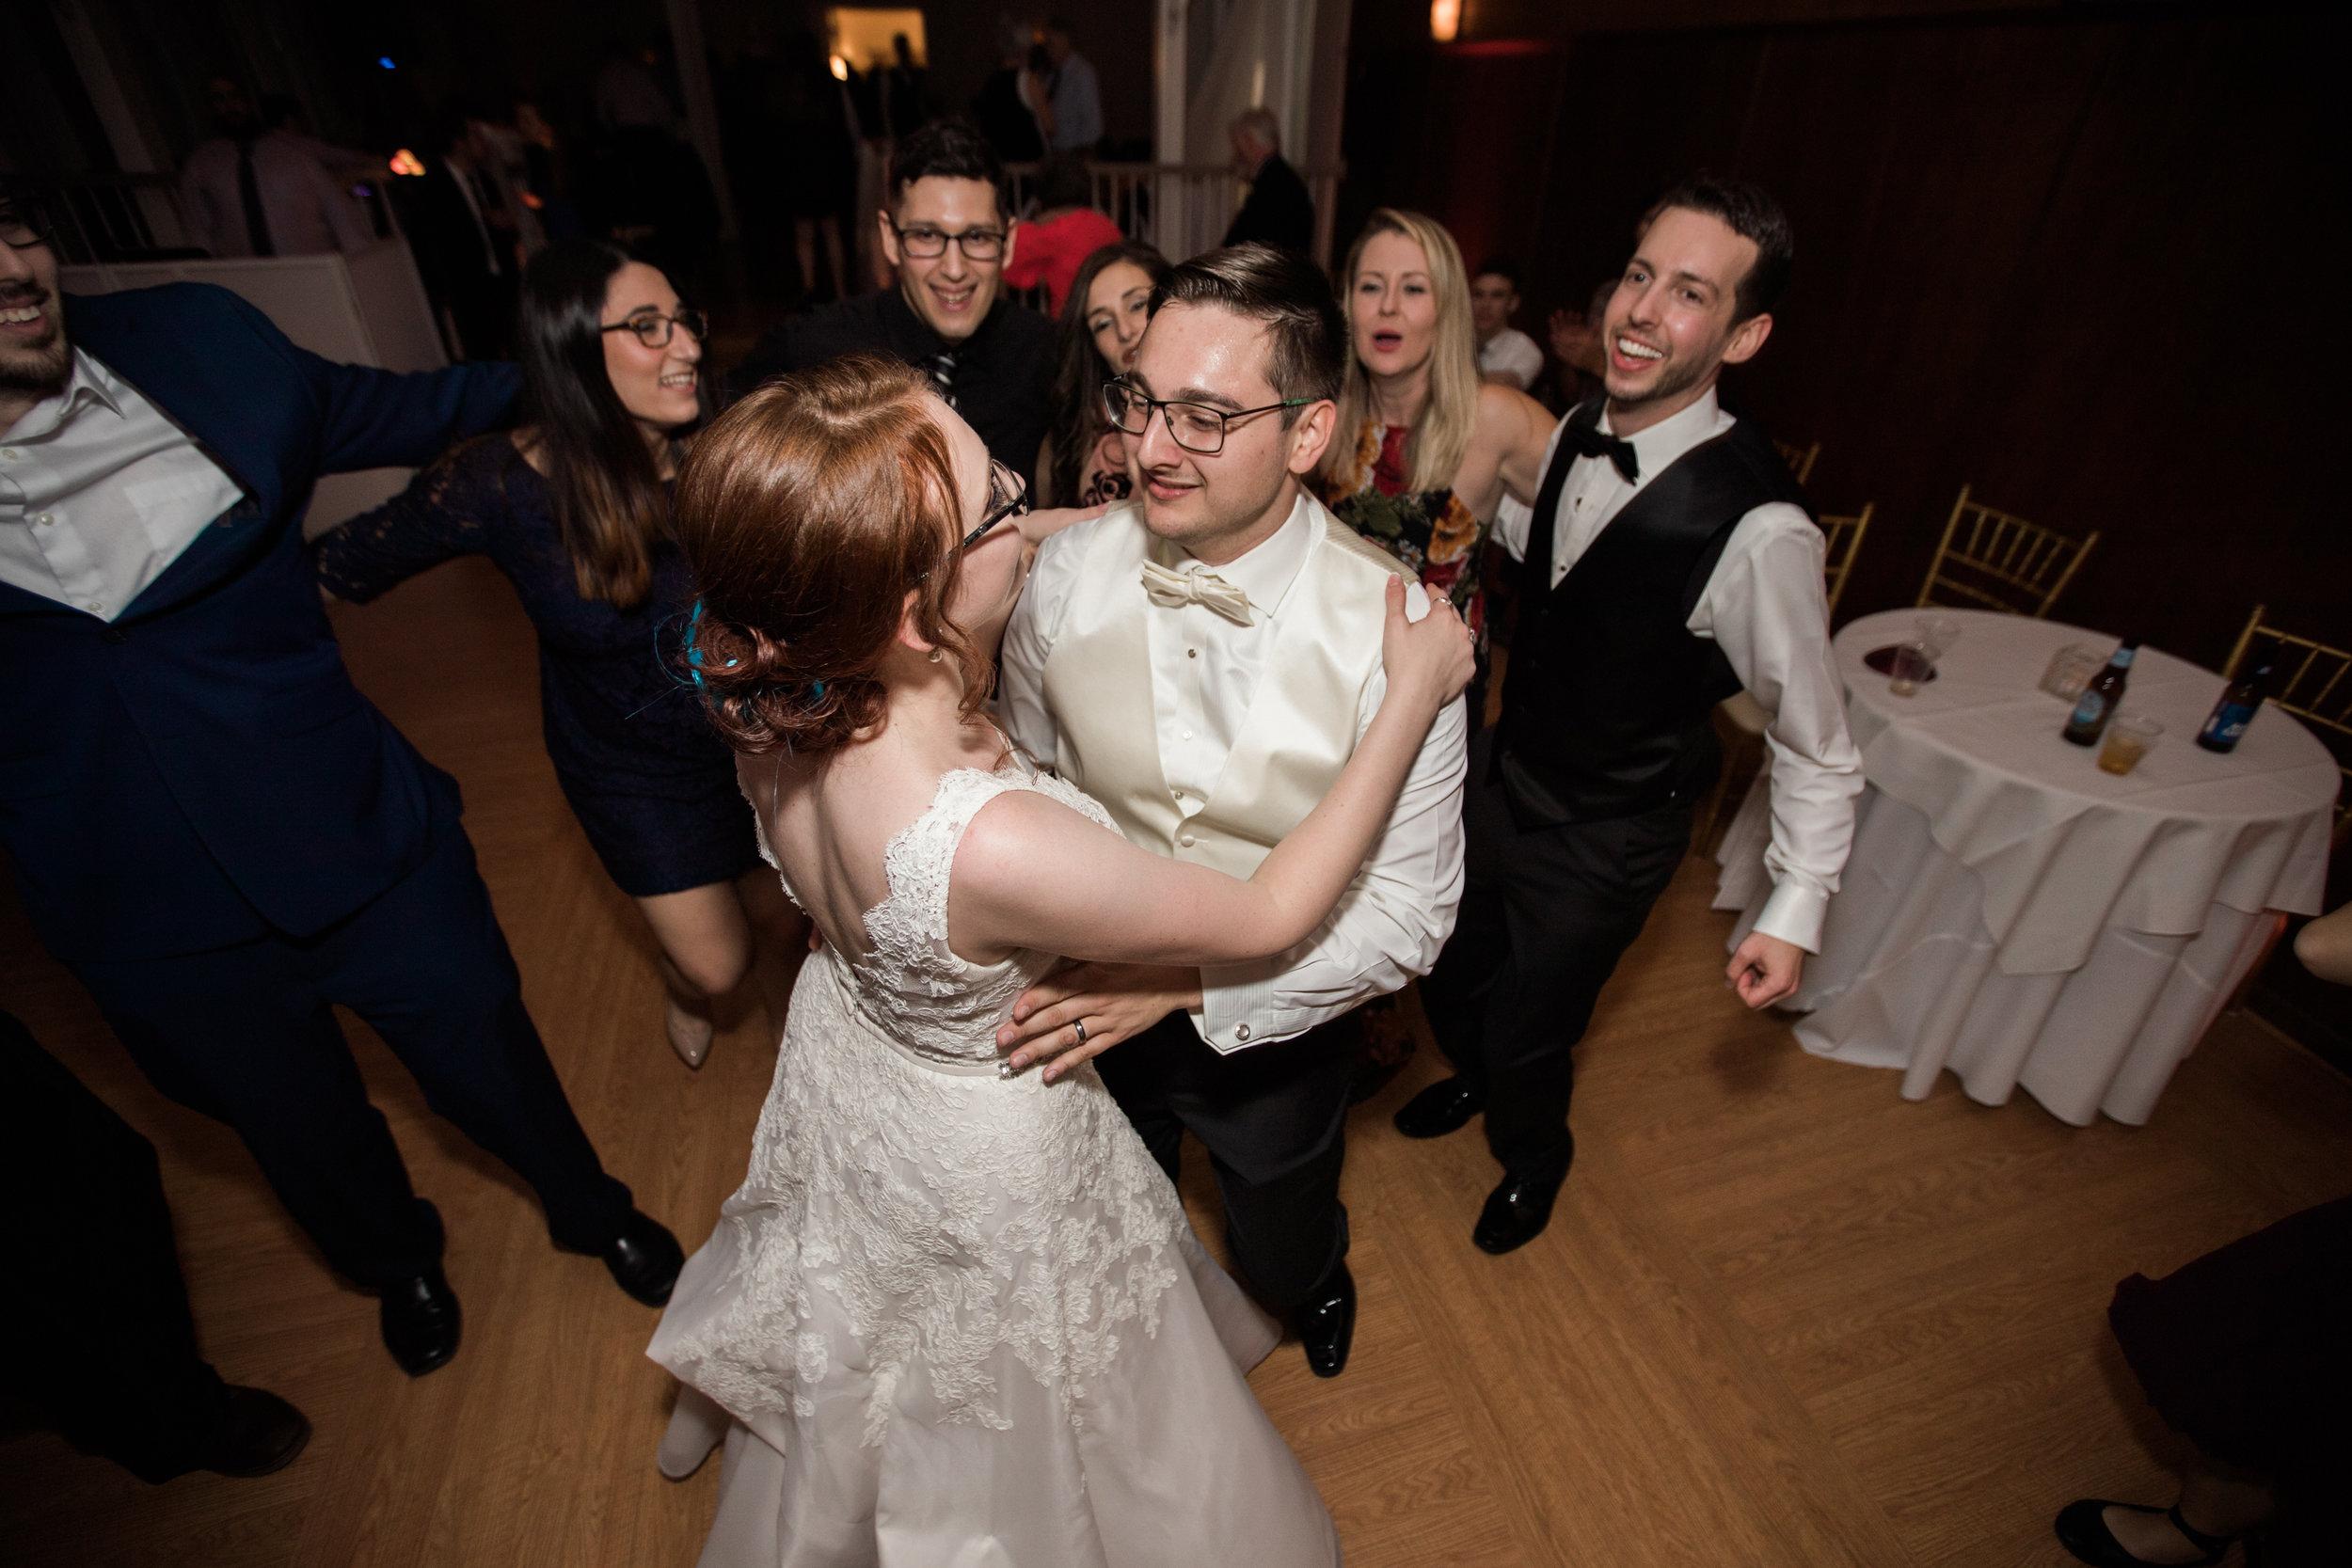 Harry Potter Wedding at Overhills Mansion Catonville Maryland Wedding Photographers Megapixels Media (125 of 134).jpg